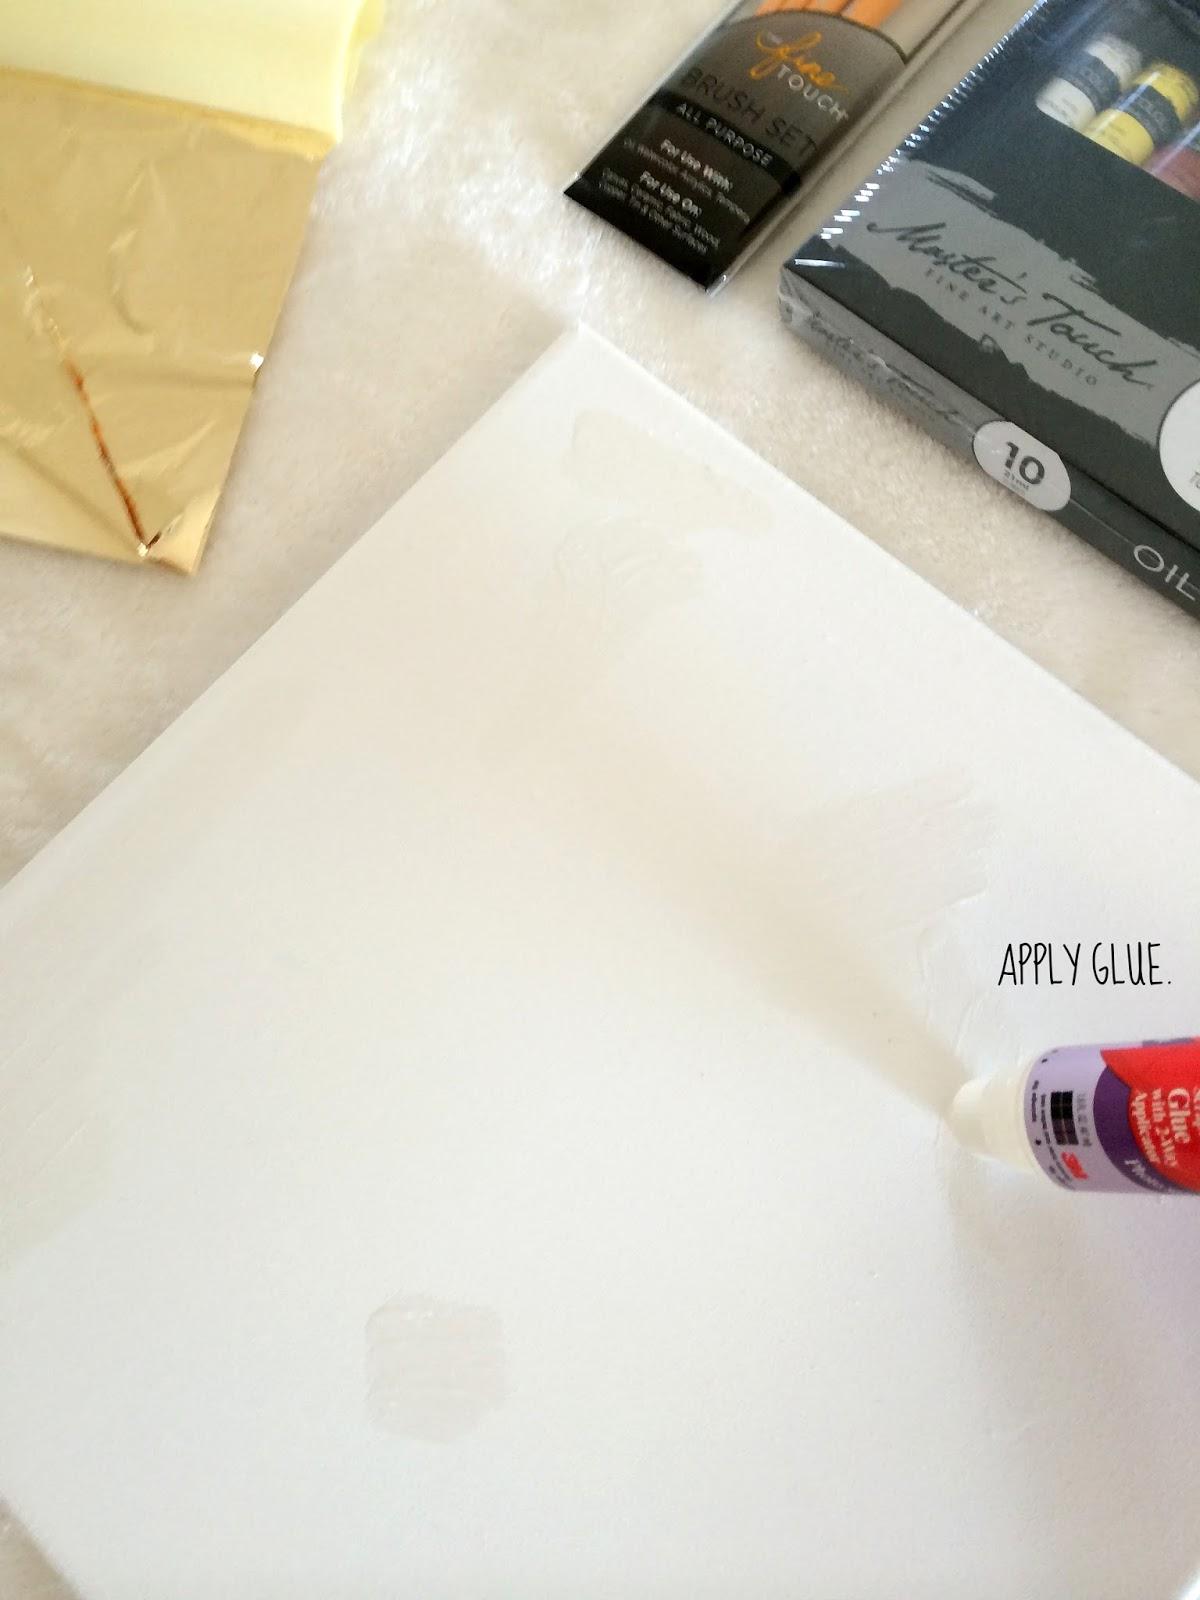 How To Make DIY Gold Leaf Abstract Art | LiveLoveDIY ... - photo #8